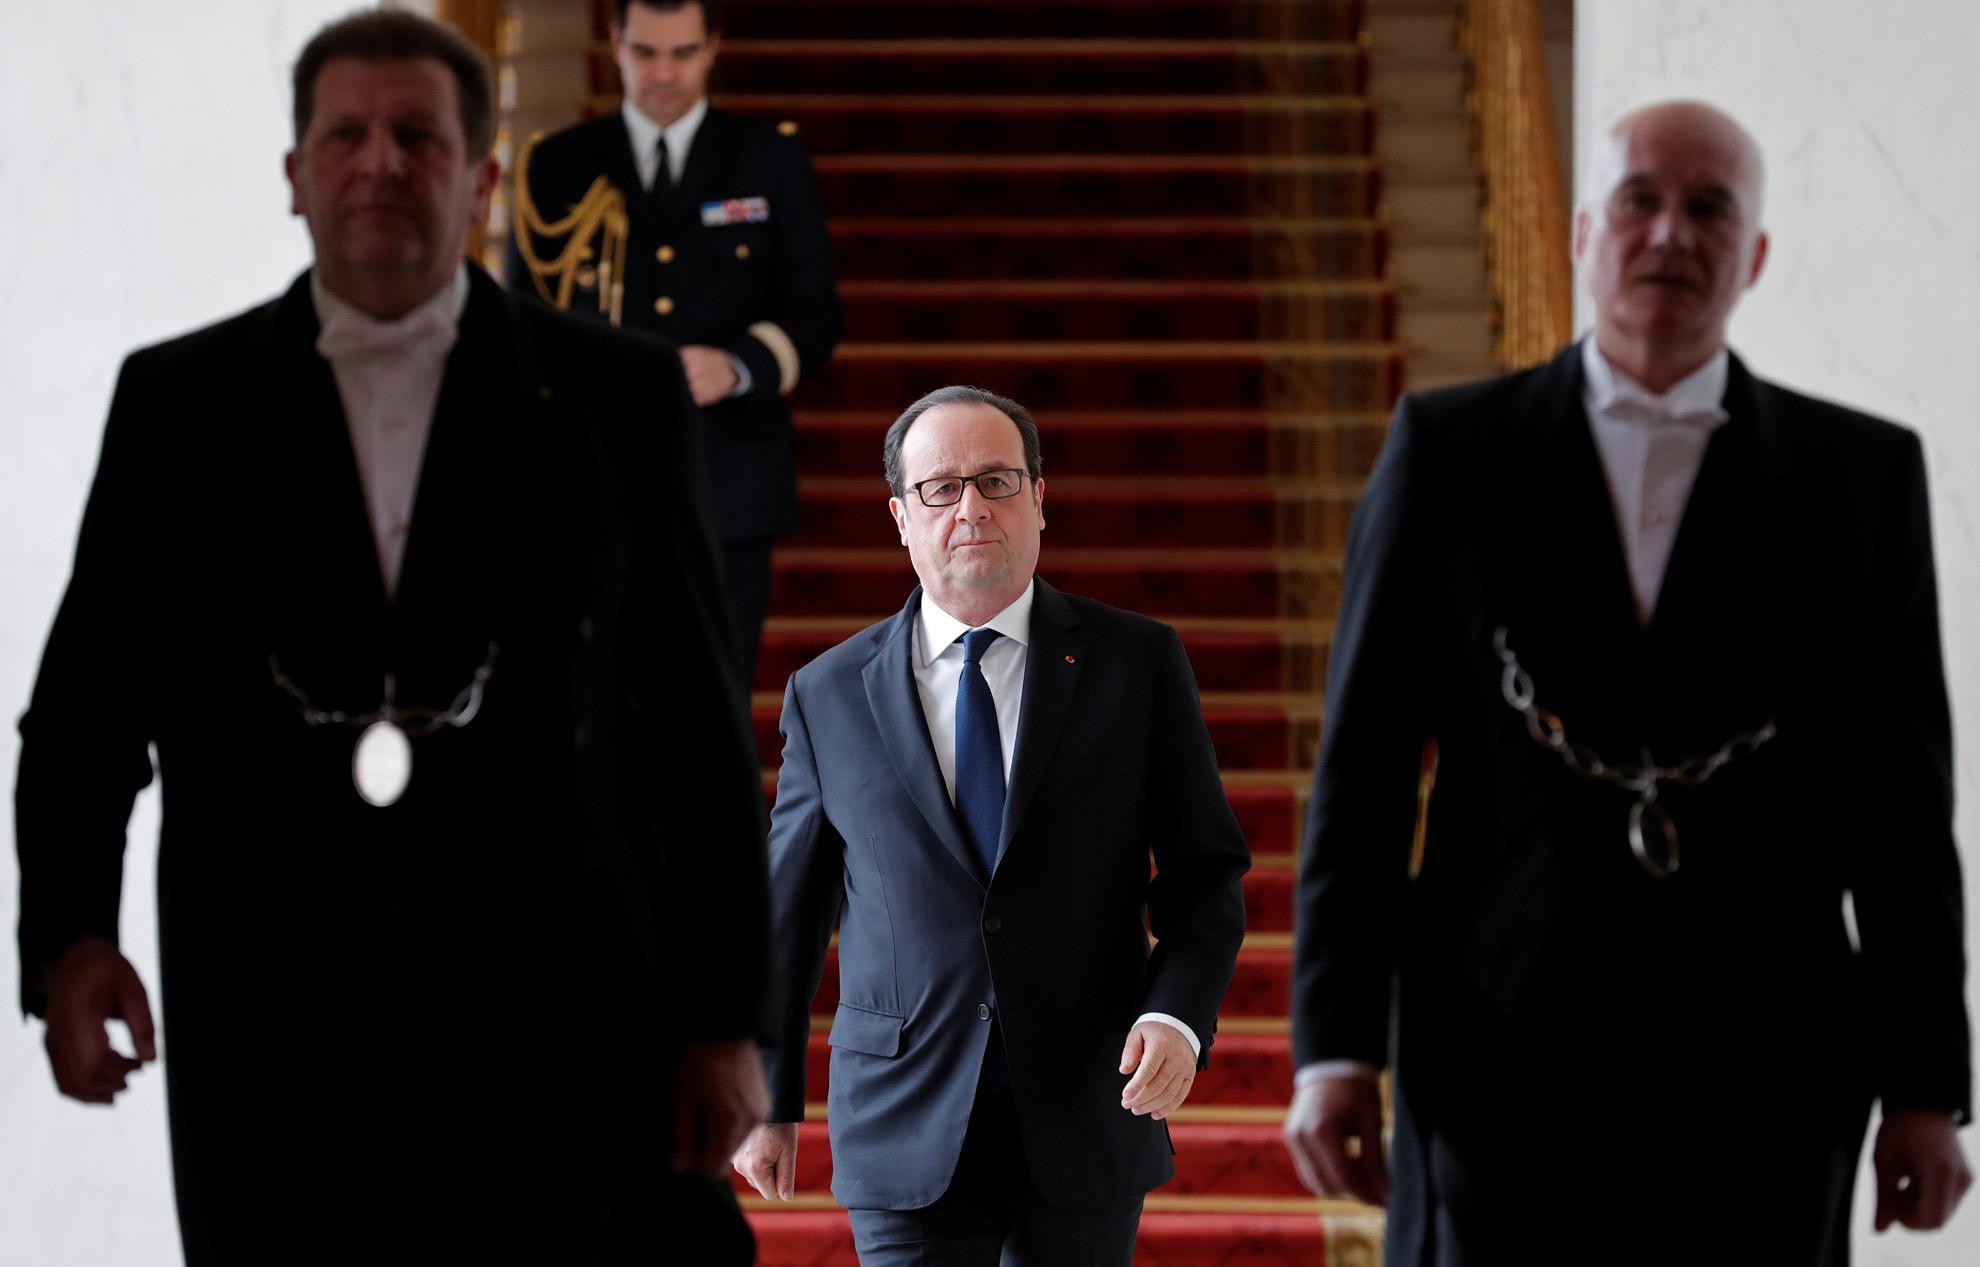 Mitterrand chirac sarkozy hollande à chacun son cabinet noir